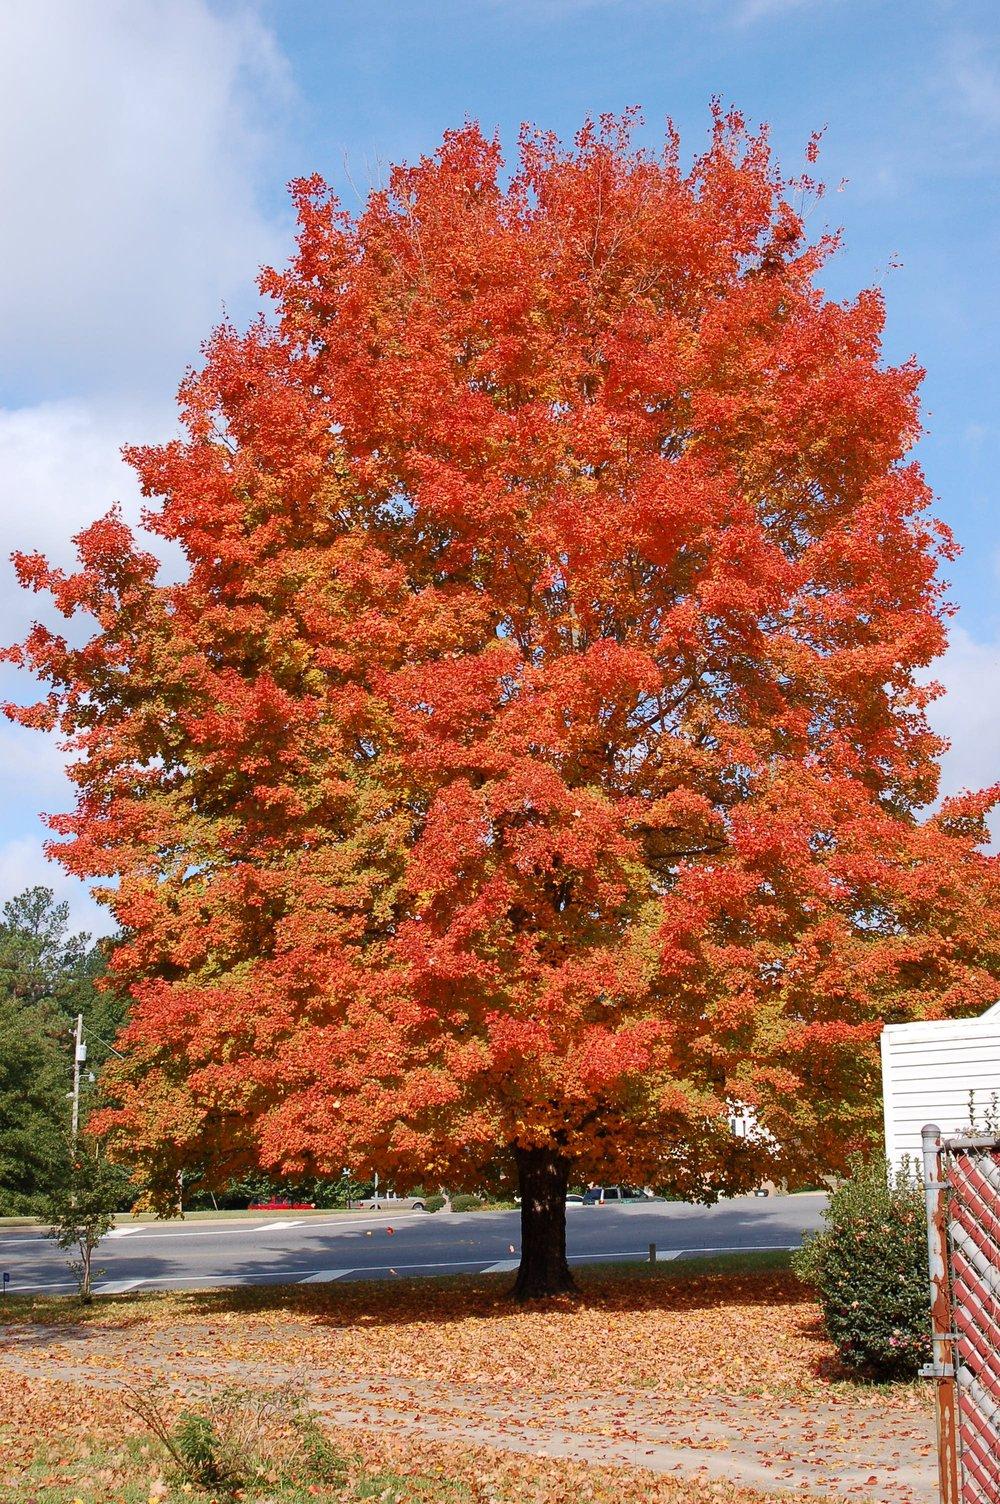 Harvest-Moon-Sugar-Maple-Acer-saccharum-fall-color-habit-2.jpg